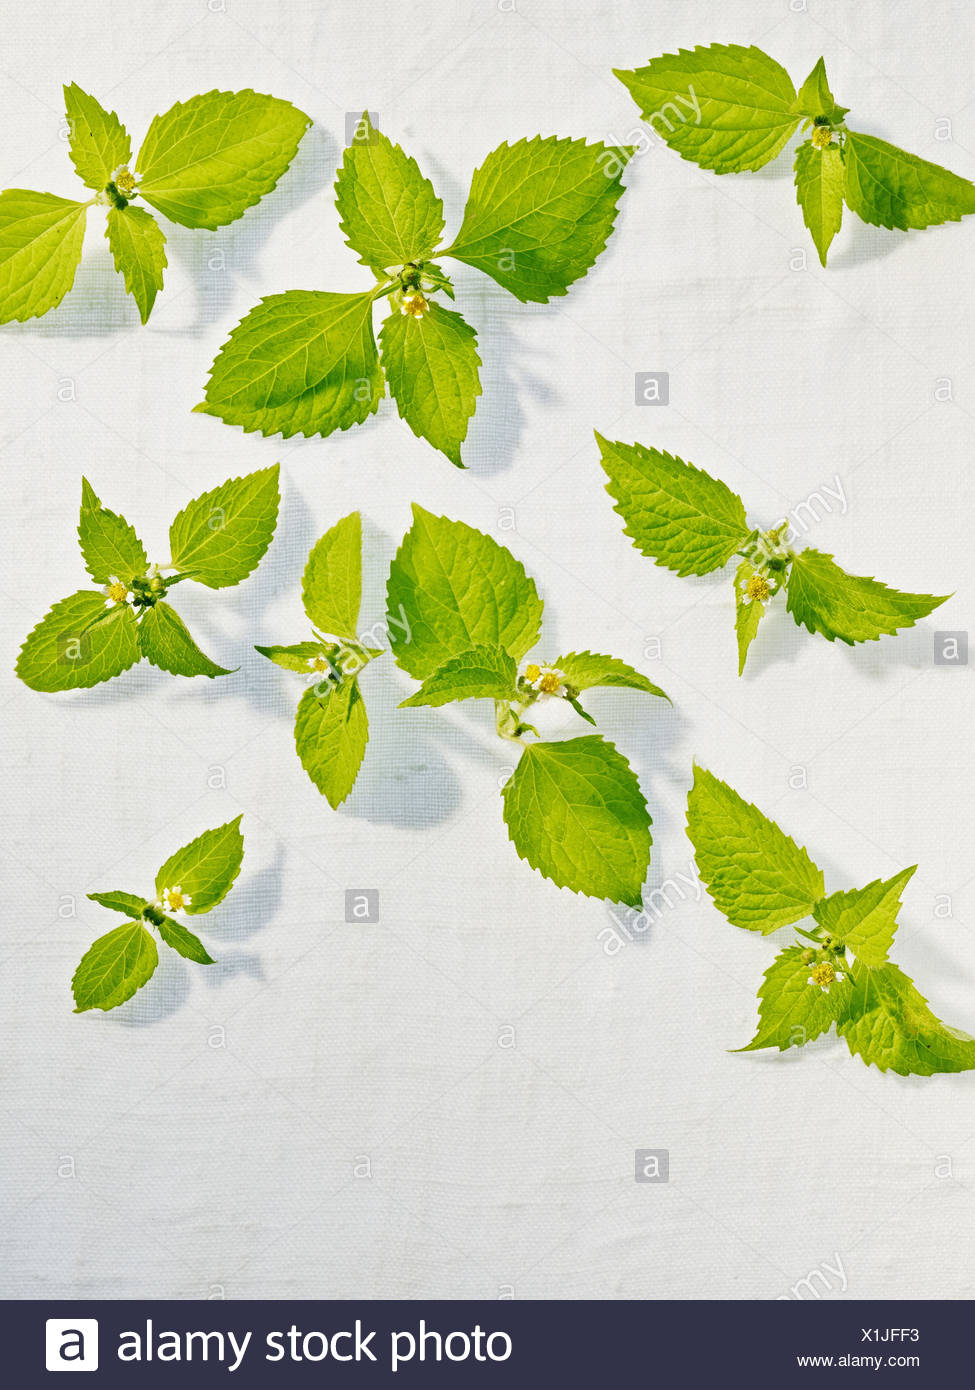 Galinsoga ciliata, leaves, green, - Stock Image